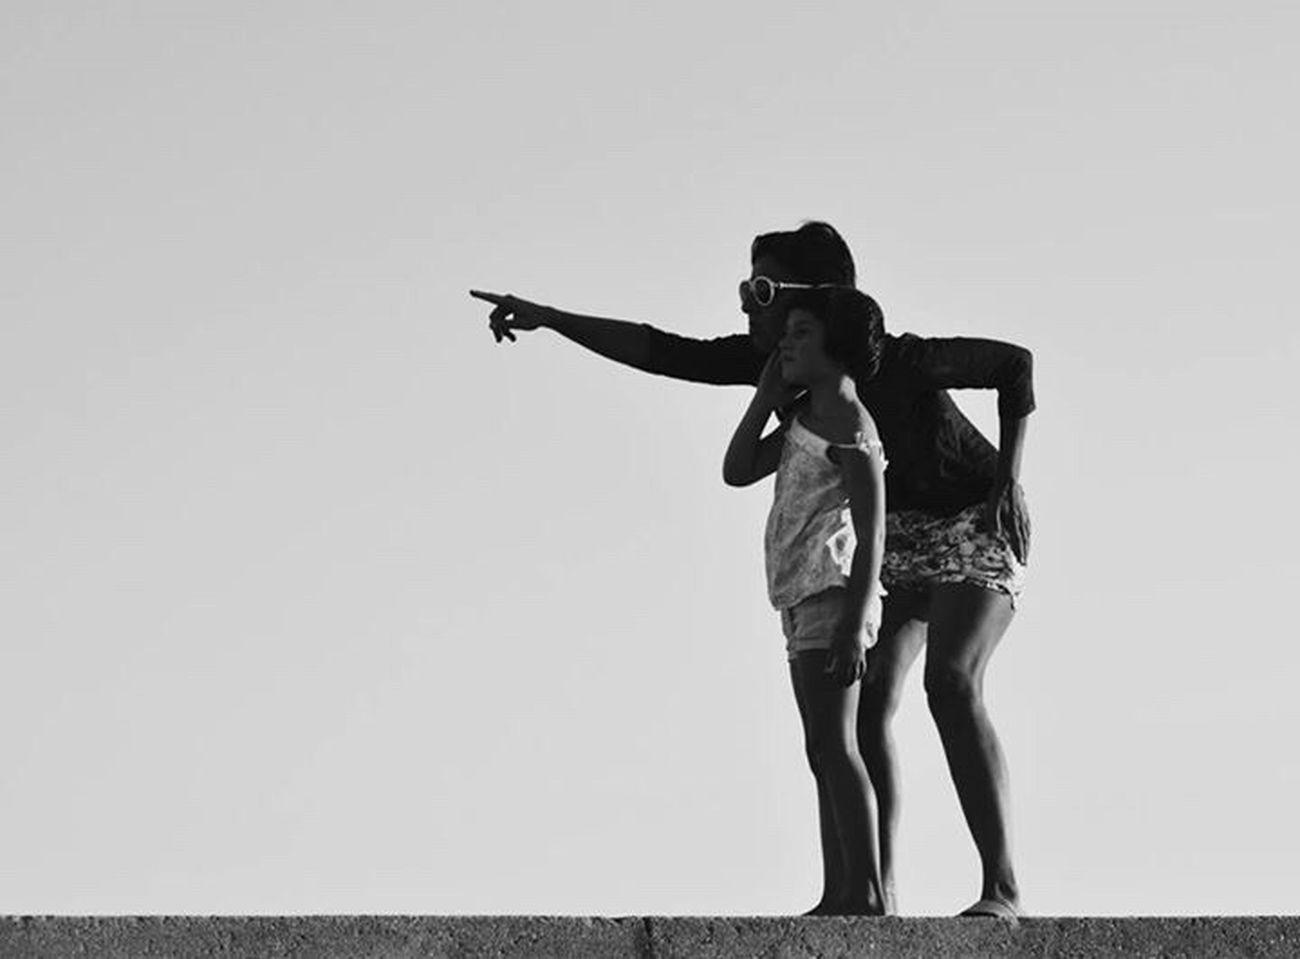 .waiting for the lucky star. | Blackandwhite Black And White Street EyeEm Streetphotography Real People Streetart Street Photography Italy Streetphoto Street Life Photography Streetlife Hello World Great Atmosphere Lifestyles EyeEm Best Edits Photooftheday Eye4photography  Photographylovers Black & White Biancoenero Bws_worldwide Bw_collection EyeEm Bnw